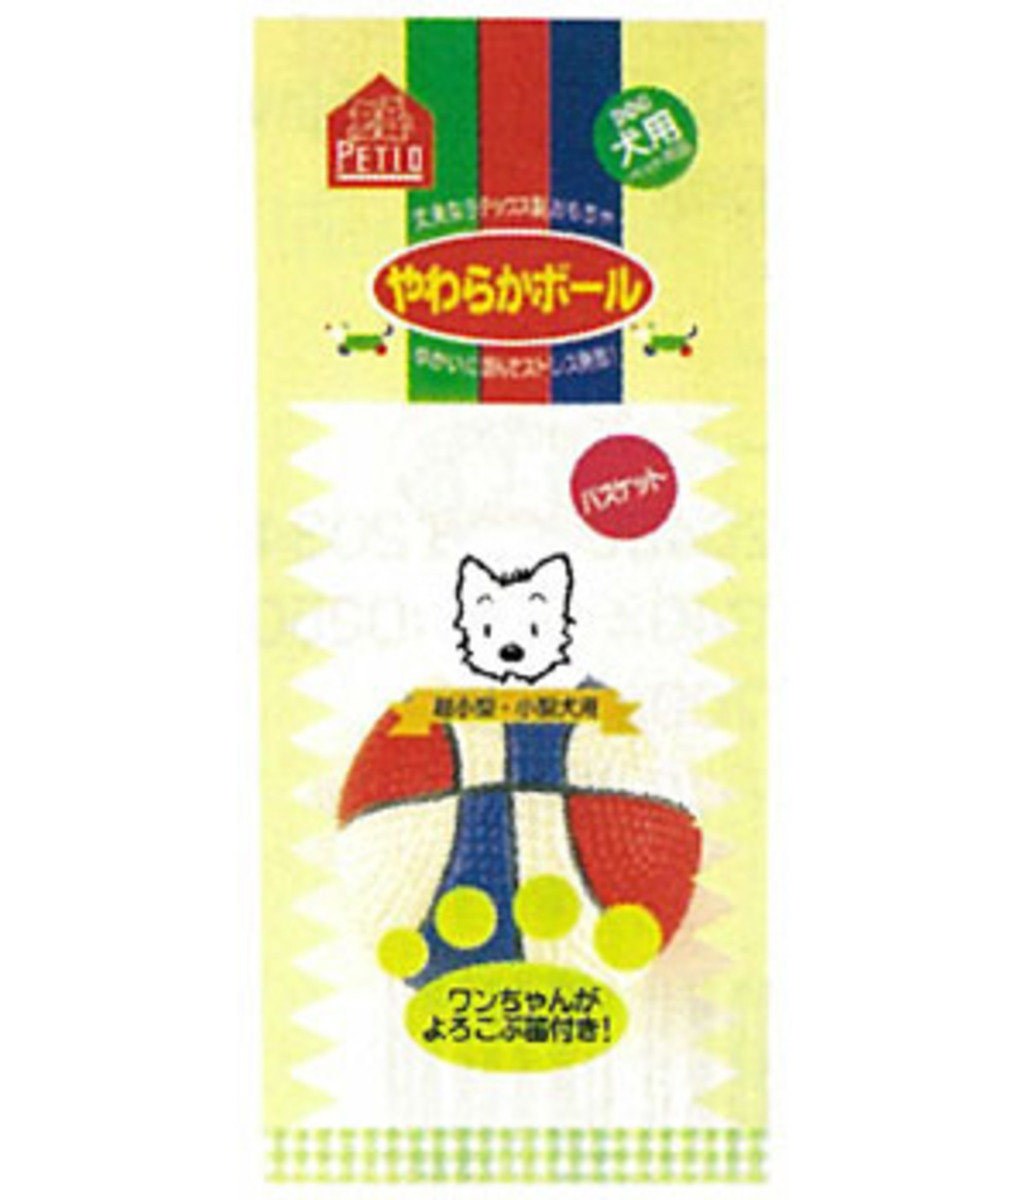 PO20053 日本 PETIO 發聲玩具 - 籃球